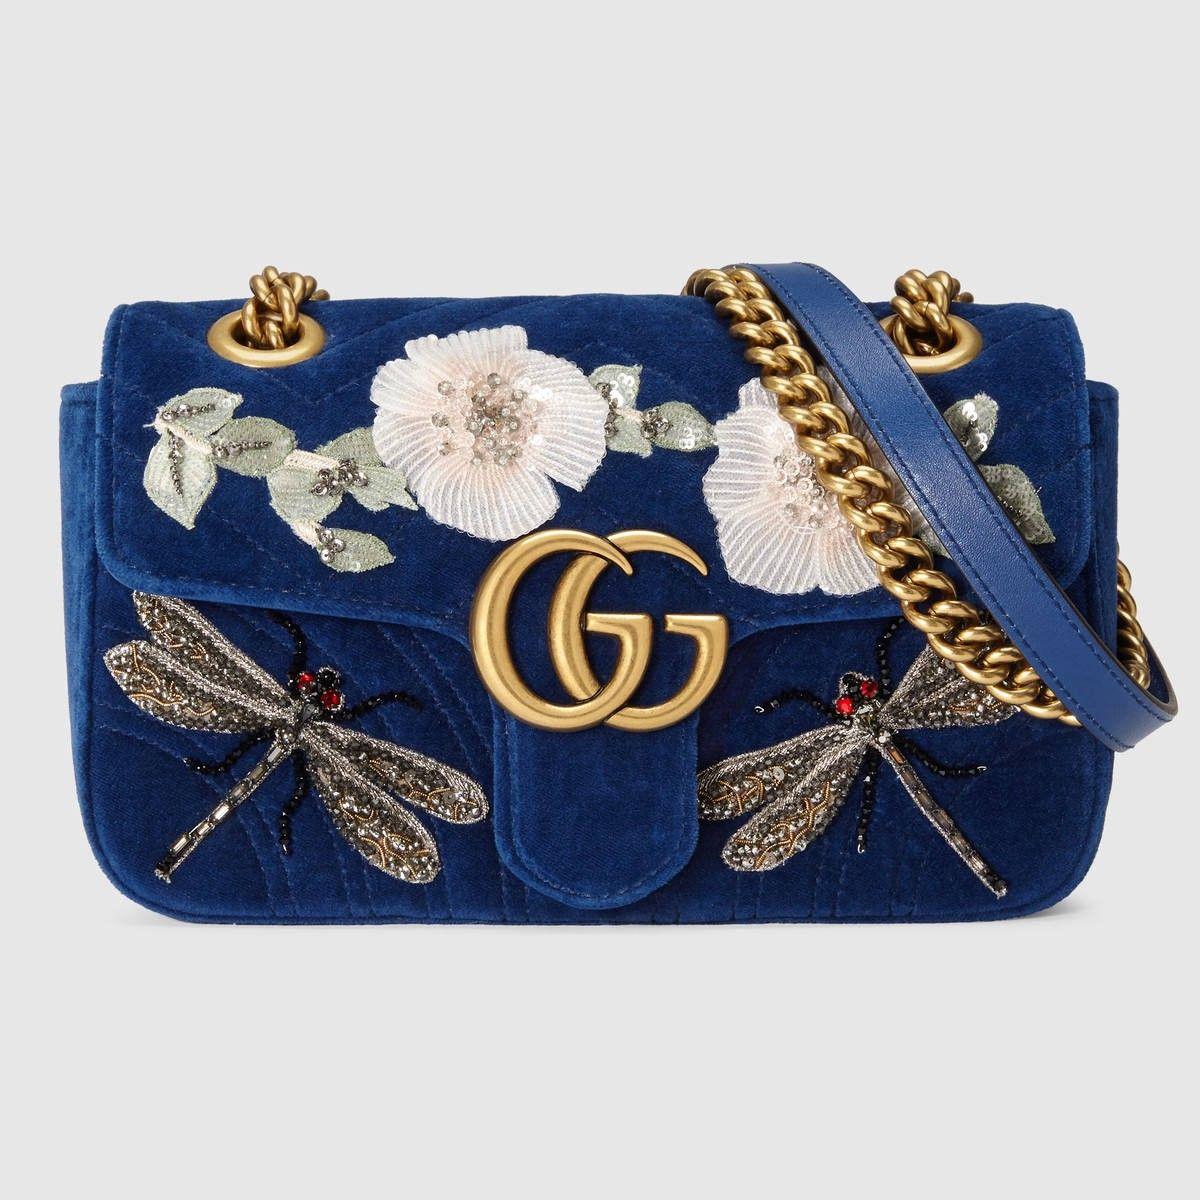 585a24a8bbc227 GUCCI GG Marmont embroidered velvet mini bag - cobalt blue chevron velvet. # gucci #bags #velvet #lining #shoulder bags #crystal #hand bags #silk #